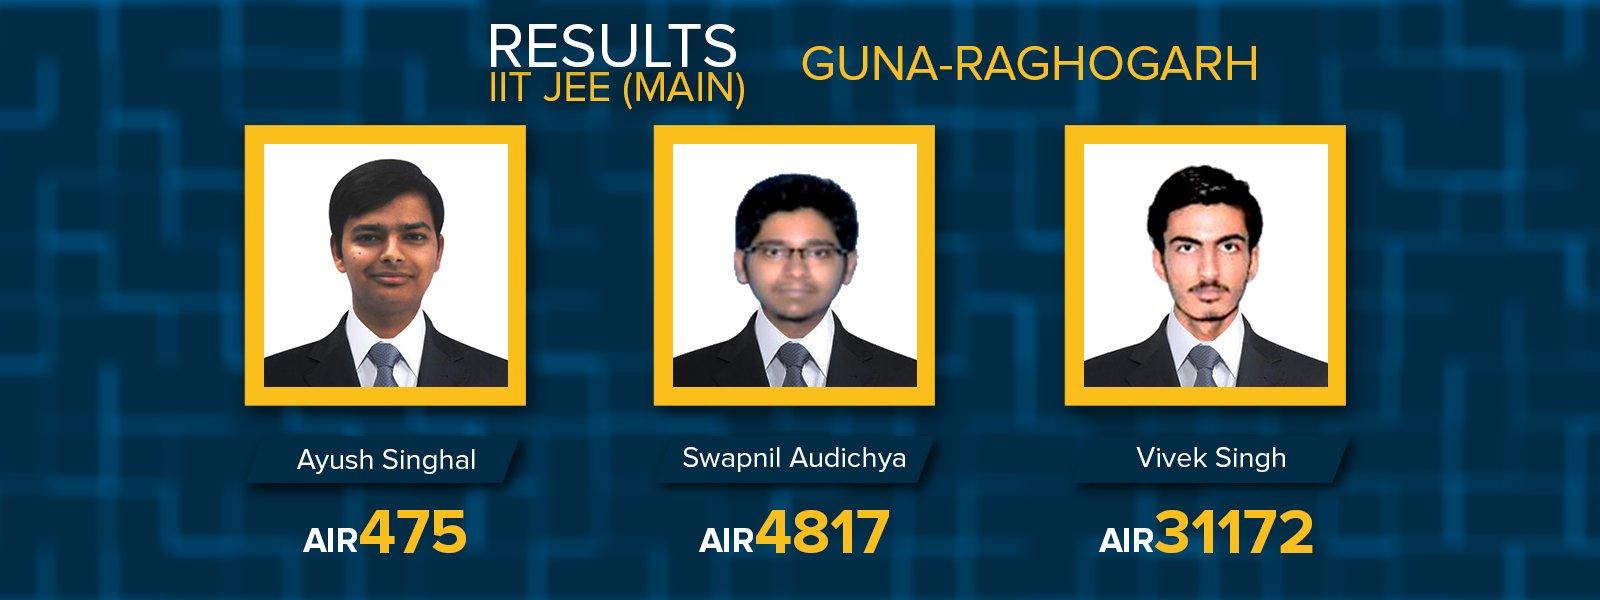 Guna - Raghogarh IIT JEE Main 2017 results